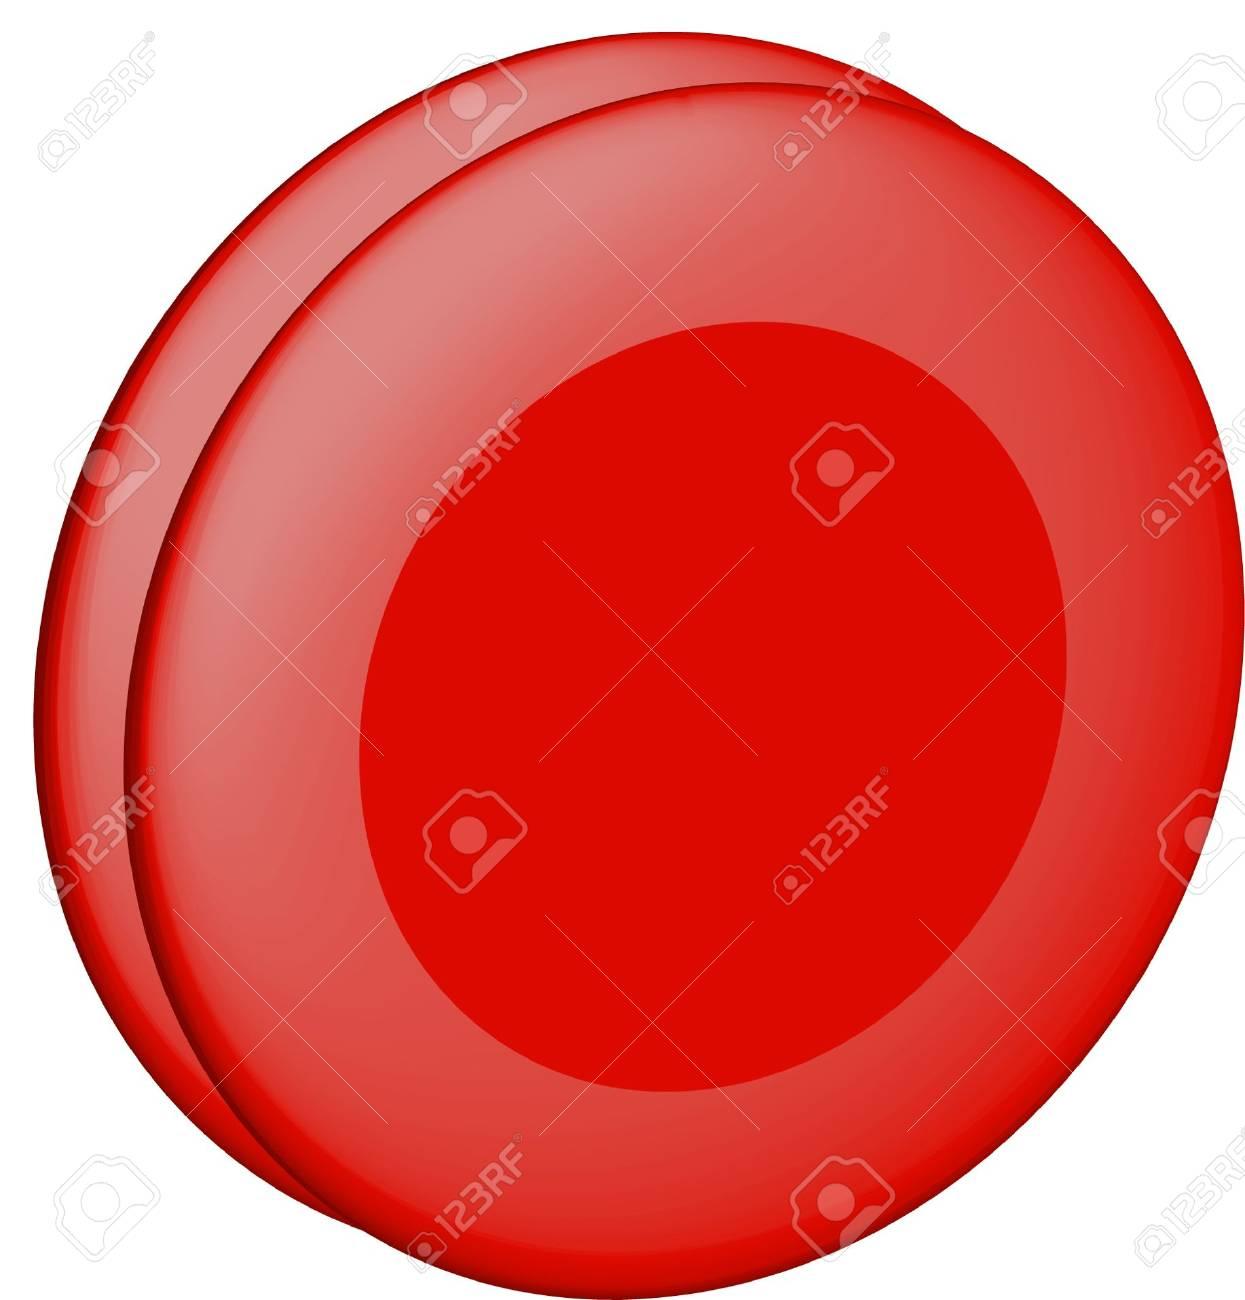 buton for navigation Stock Photo - 809411